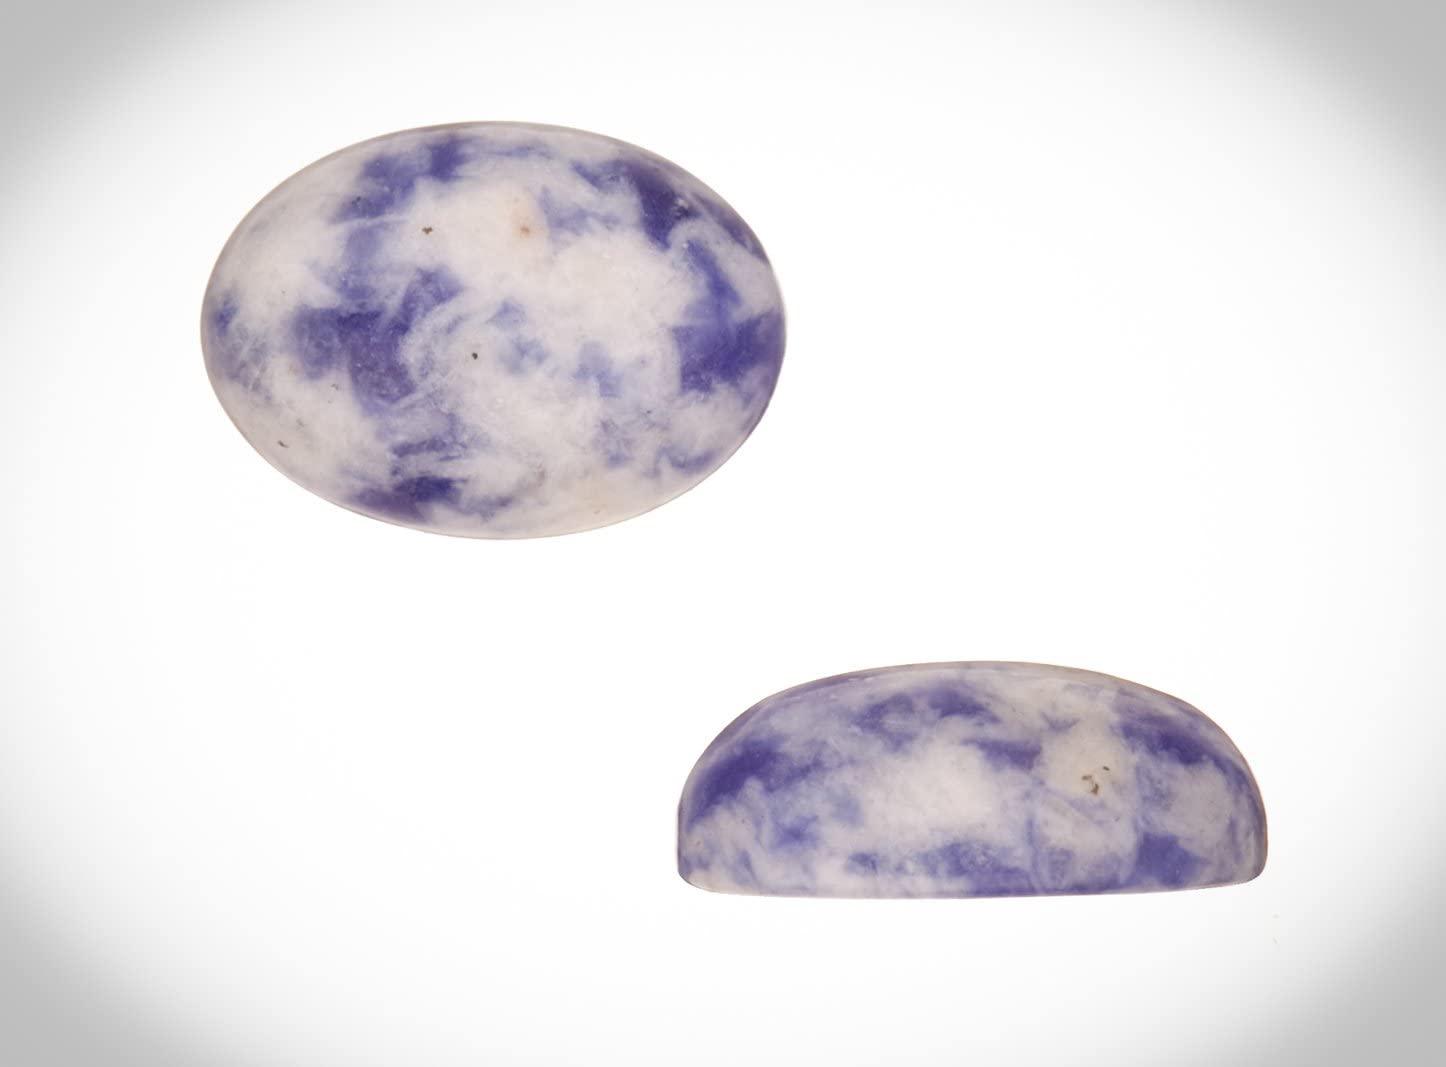 Oval Dome Semi-Precious Cabochon Stones Denim Lapis 10x14mm 4Pcs Pack